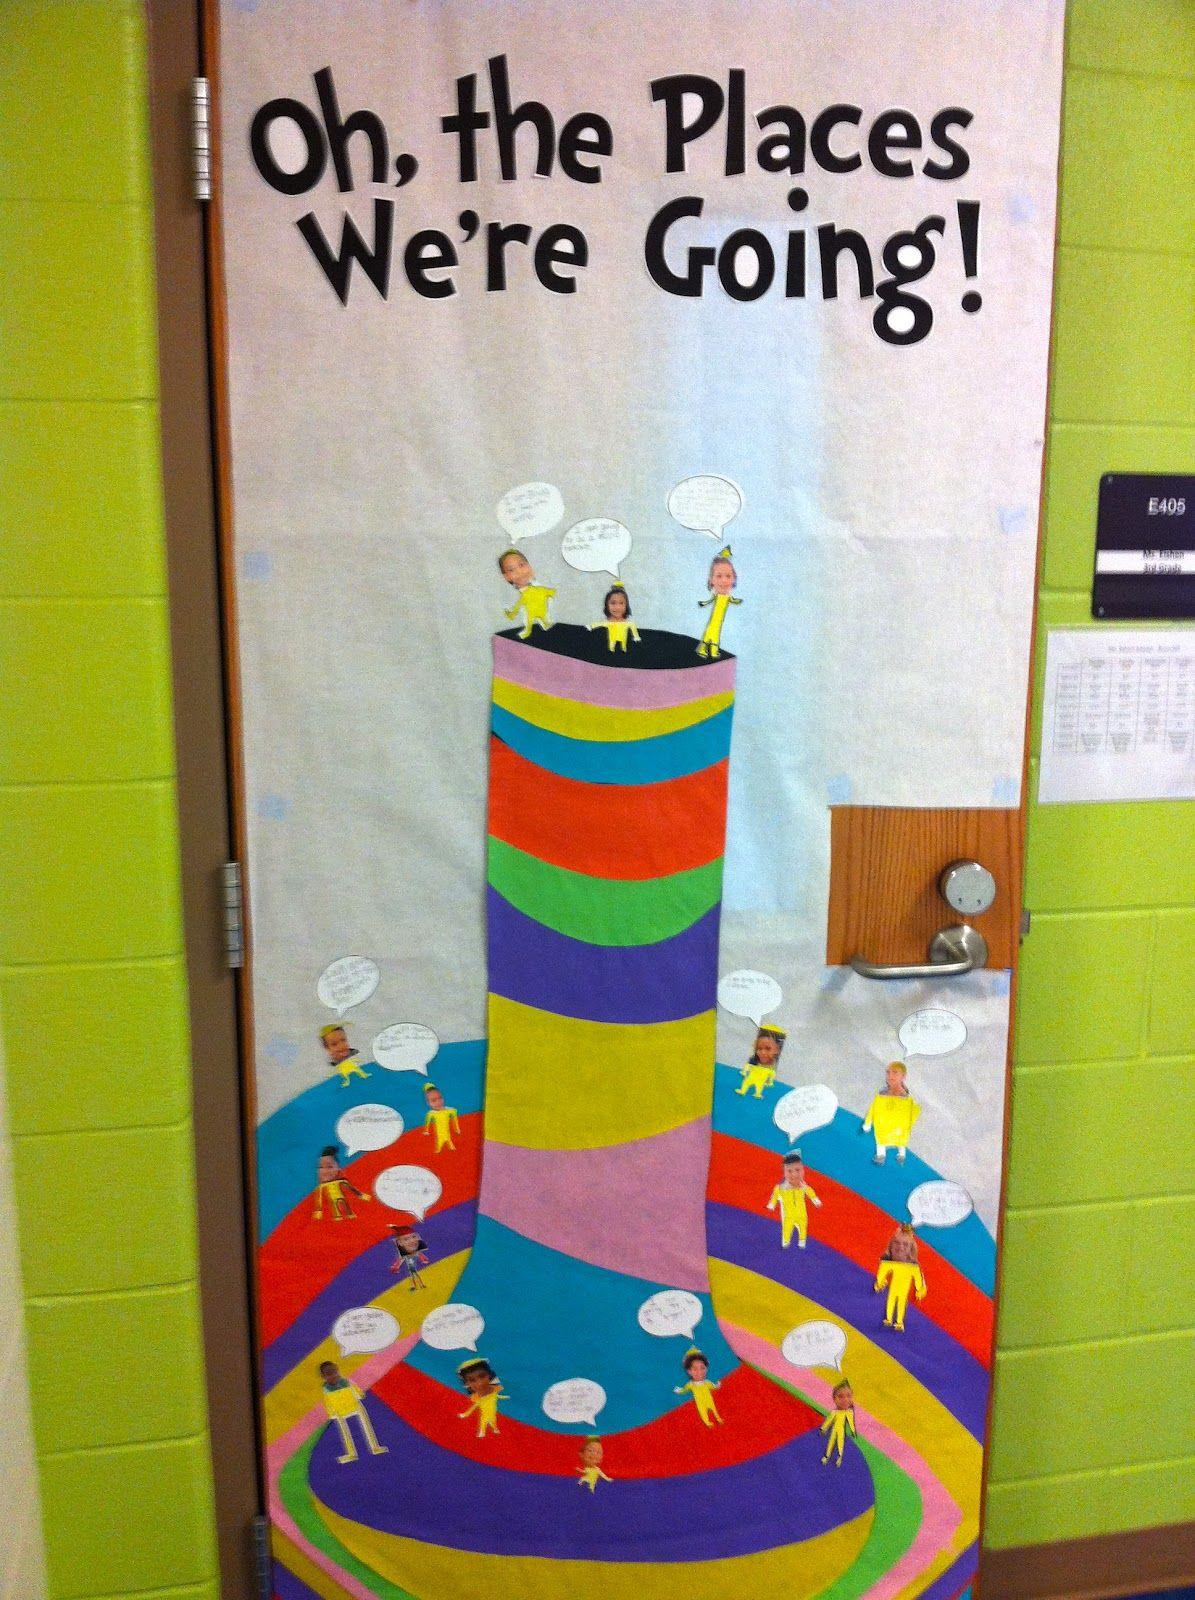 """Oh the Places We're Going!"" Dr. Seuss door decor/bulletin"